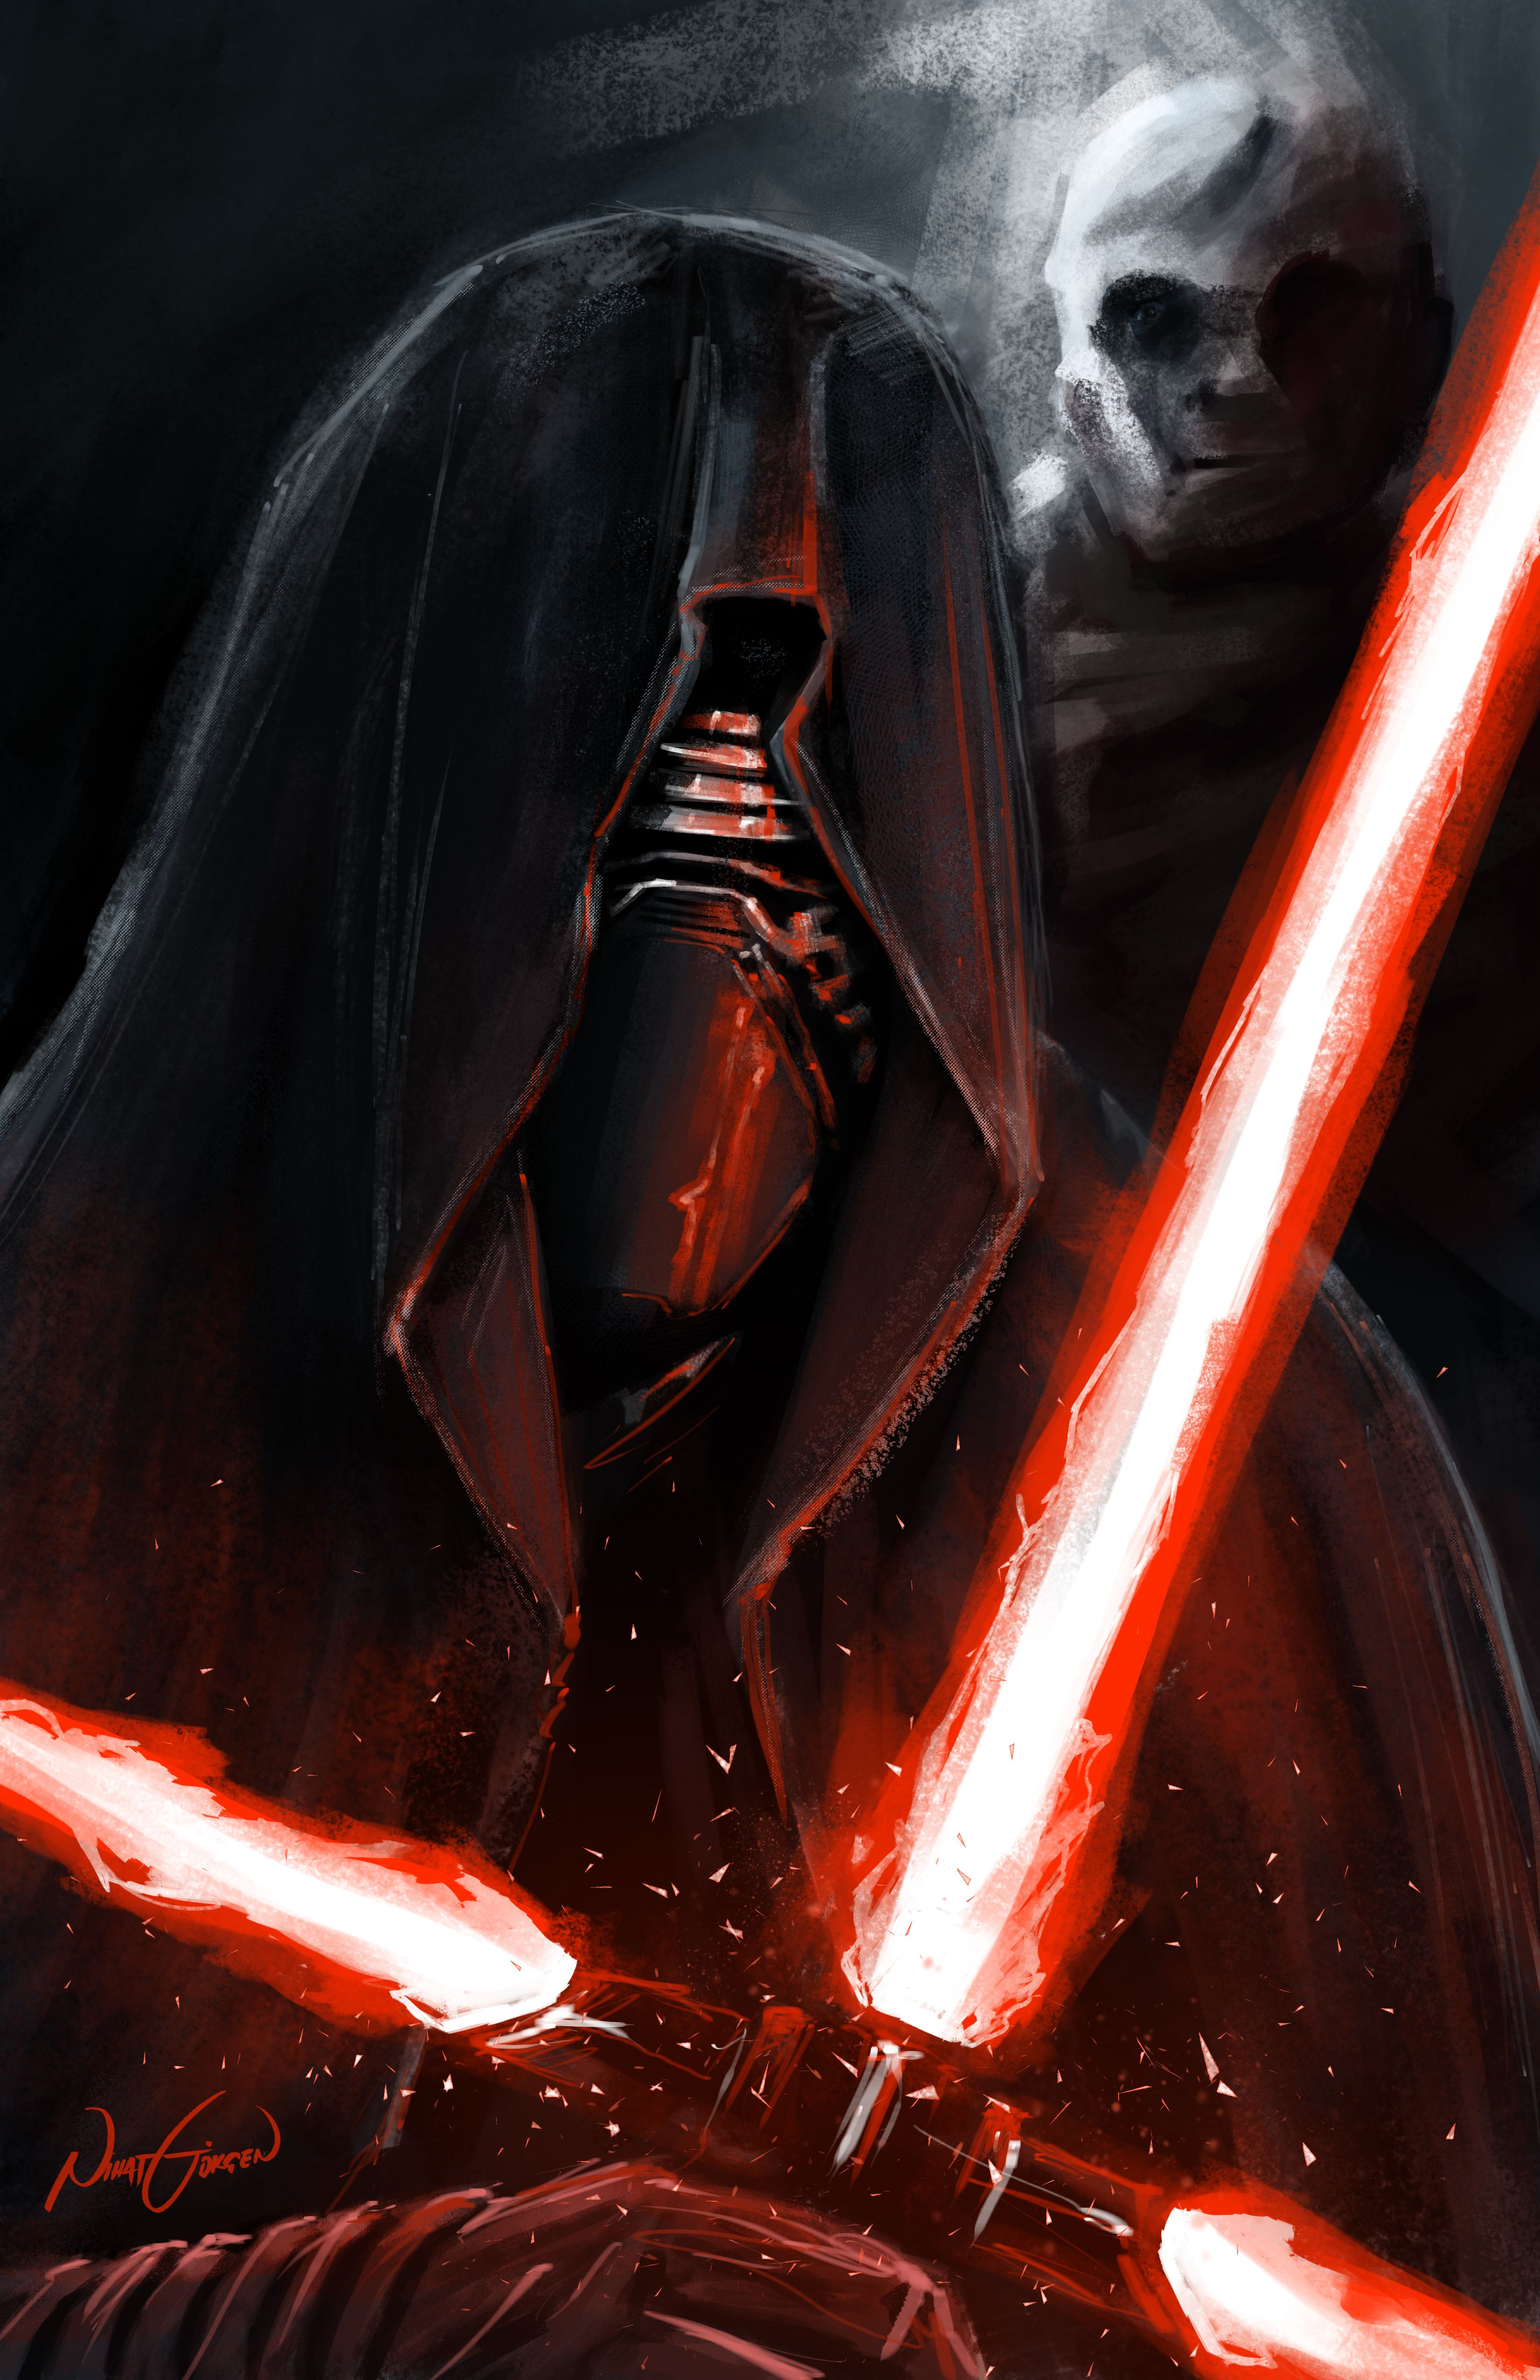 New Funko Pops Coming In 2016 Star Wars Star Wars